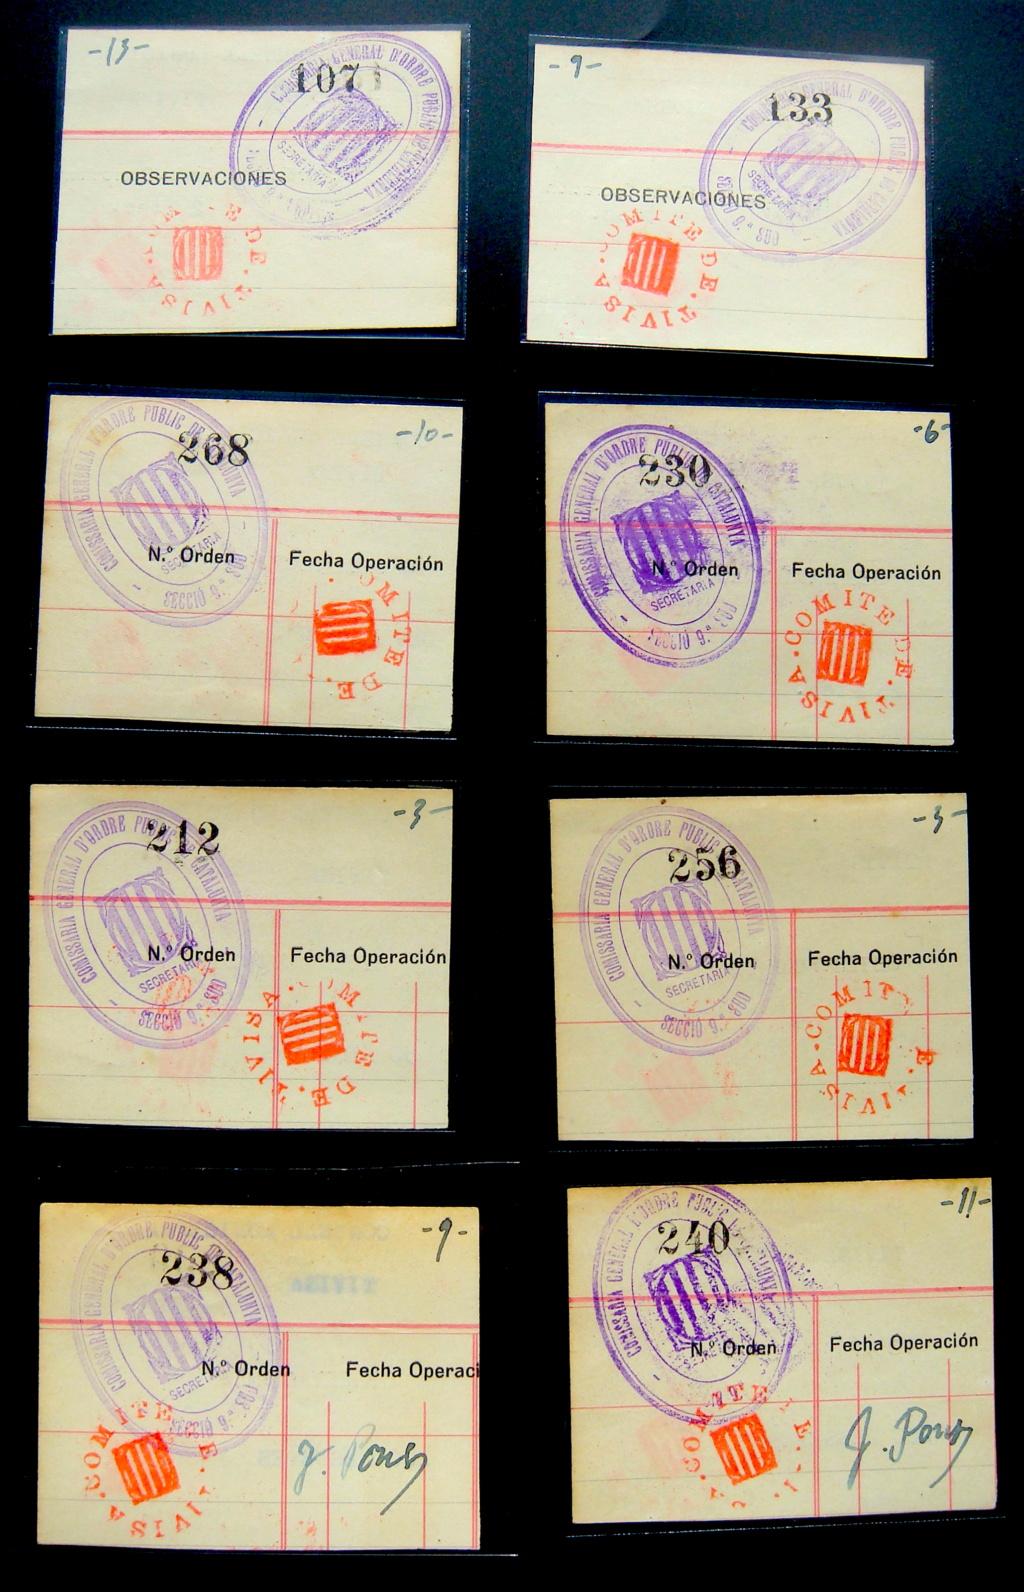 50 Pessetes Tivissa, 1937 (RRRR) Dsc05058